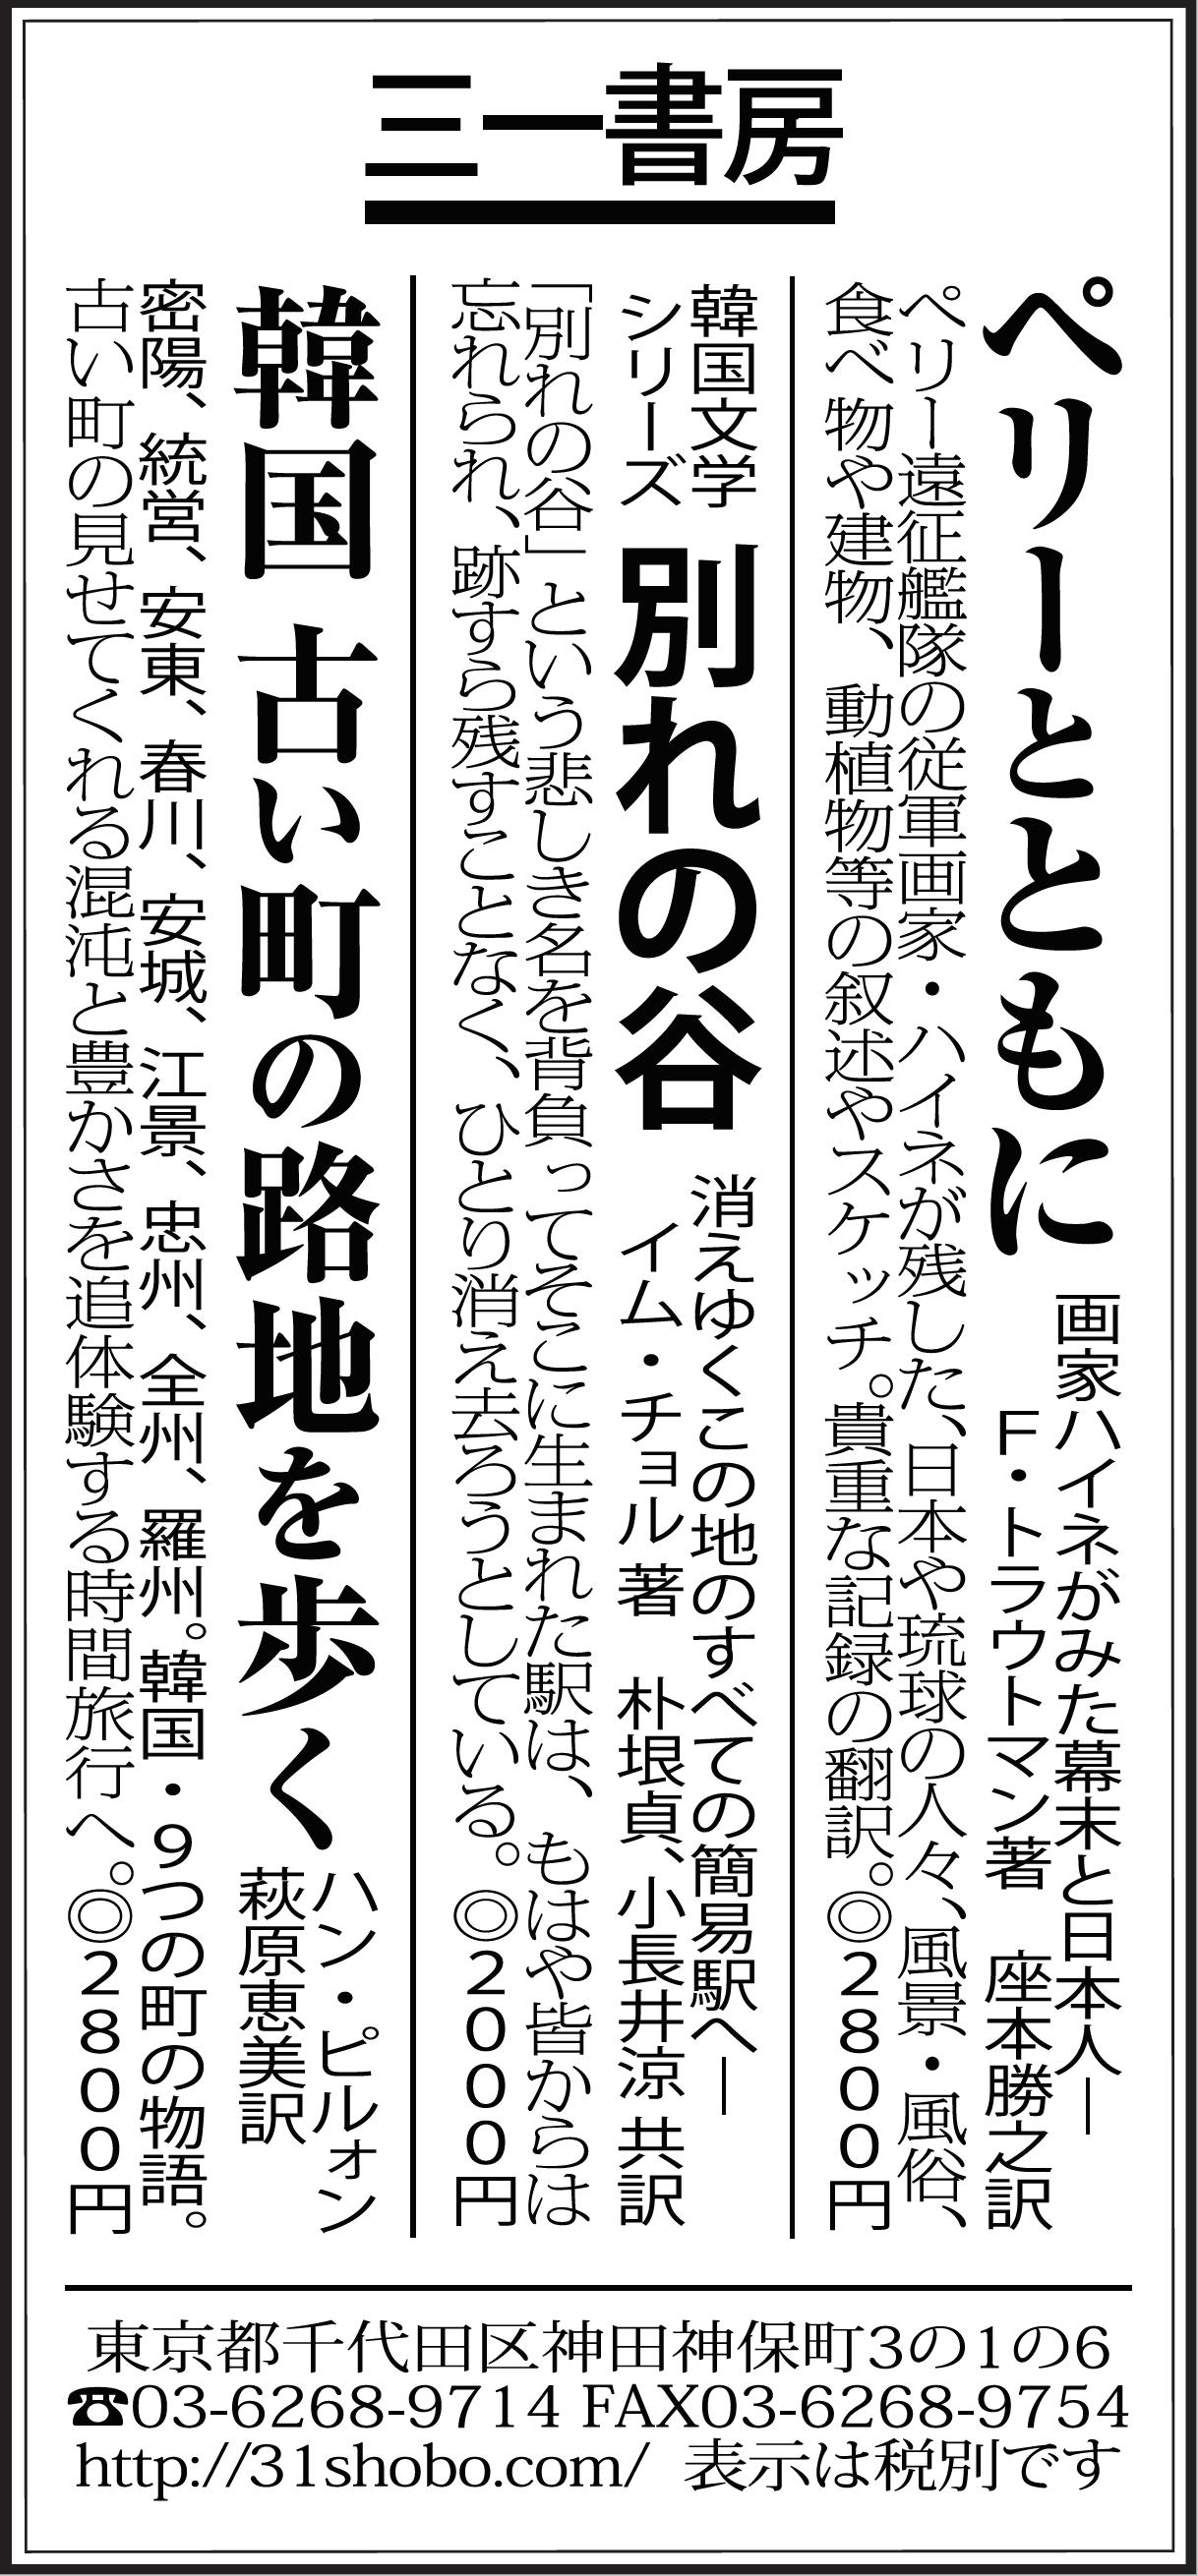 三一書房新刊広告 三一書房 san ichi shobo publishing inc